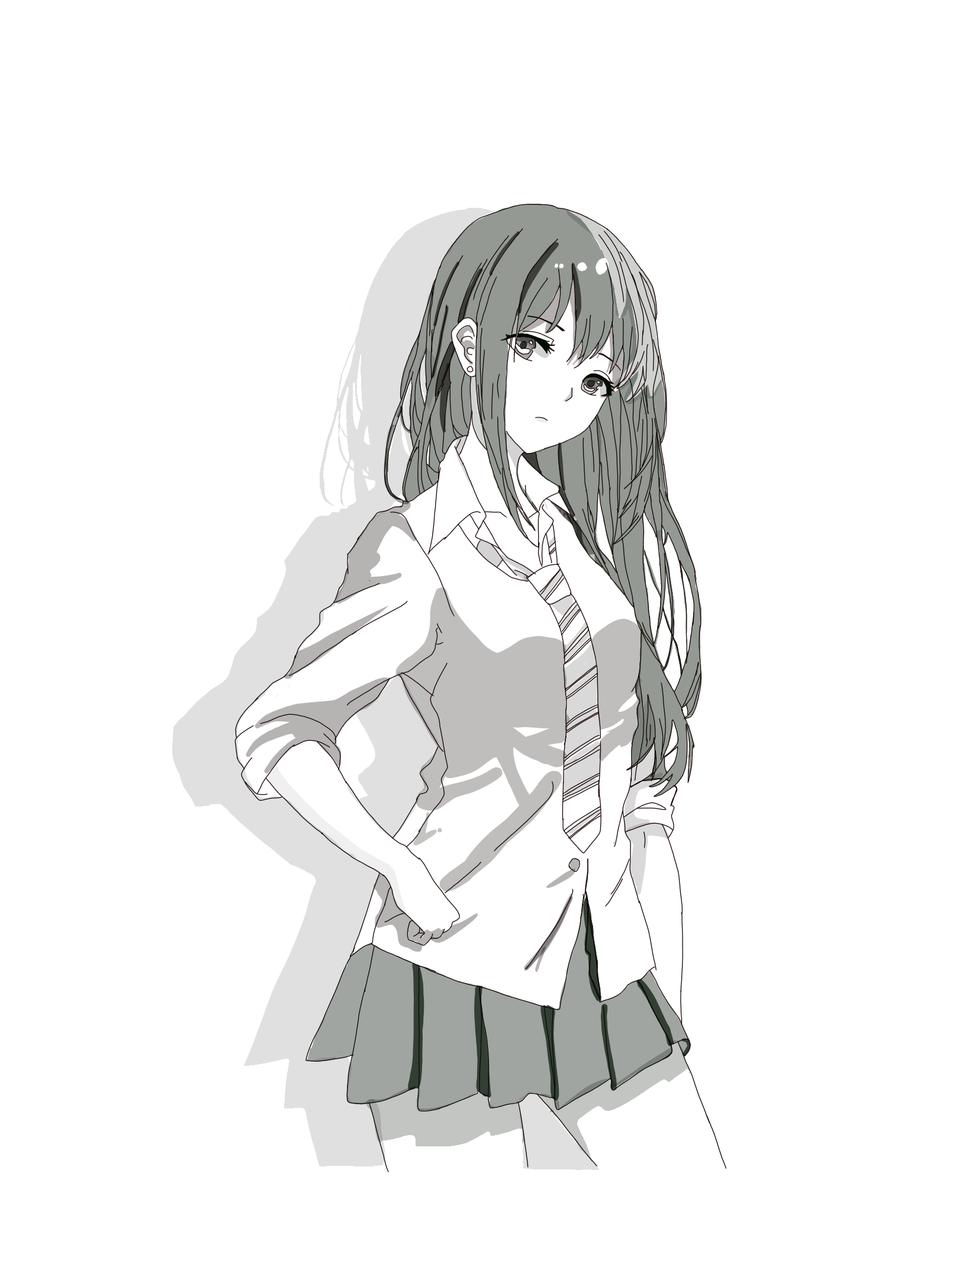 YO Illust of Melody medibangpaint fanart animegirl anime animeschoolgirl